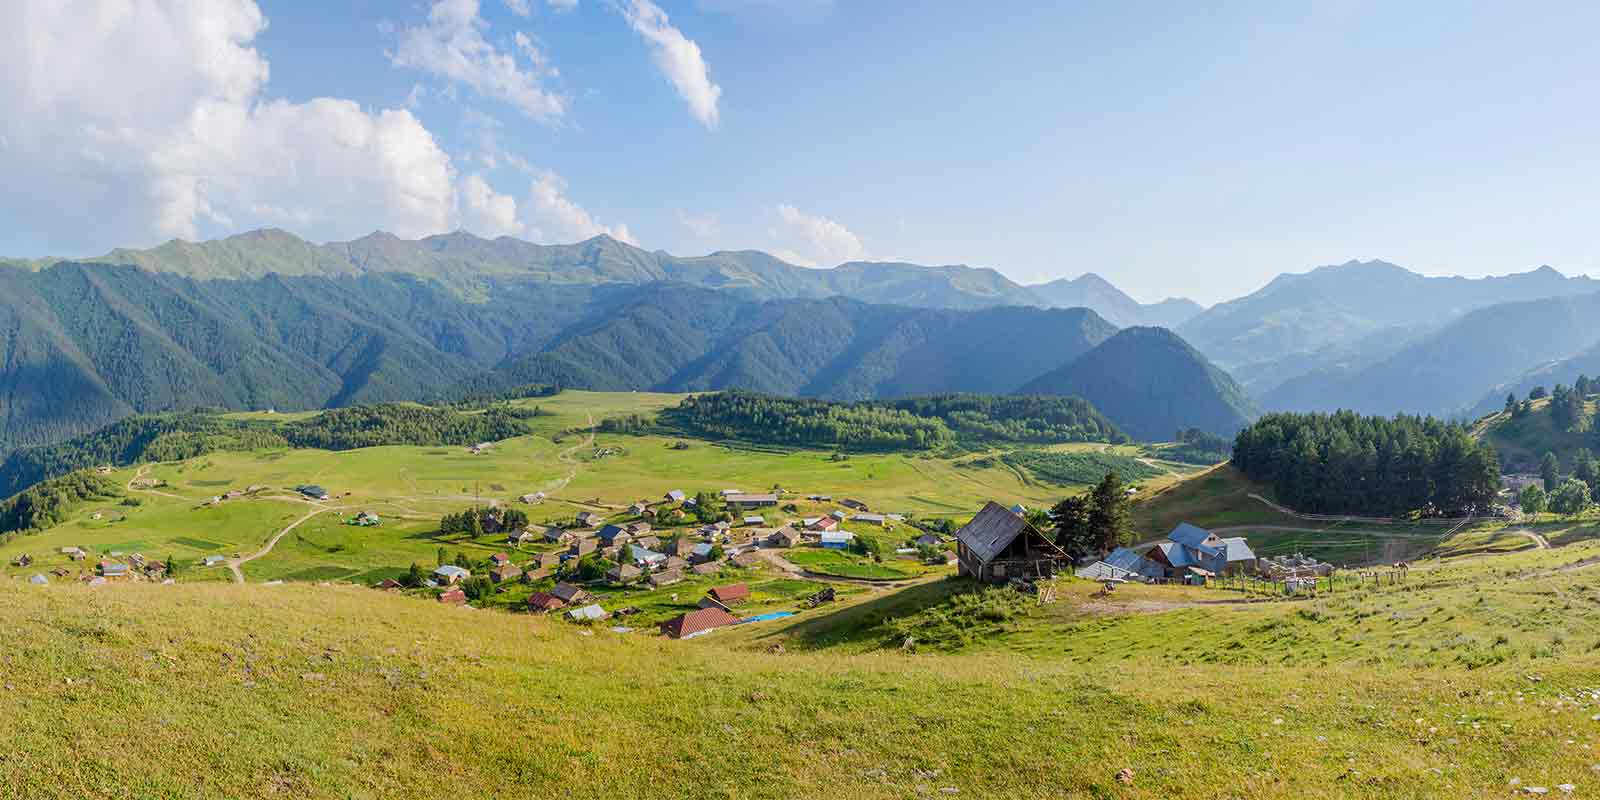 Omalo Village in Tusheti National Park in the Caucasus mountains in Georgia